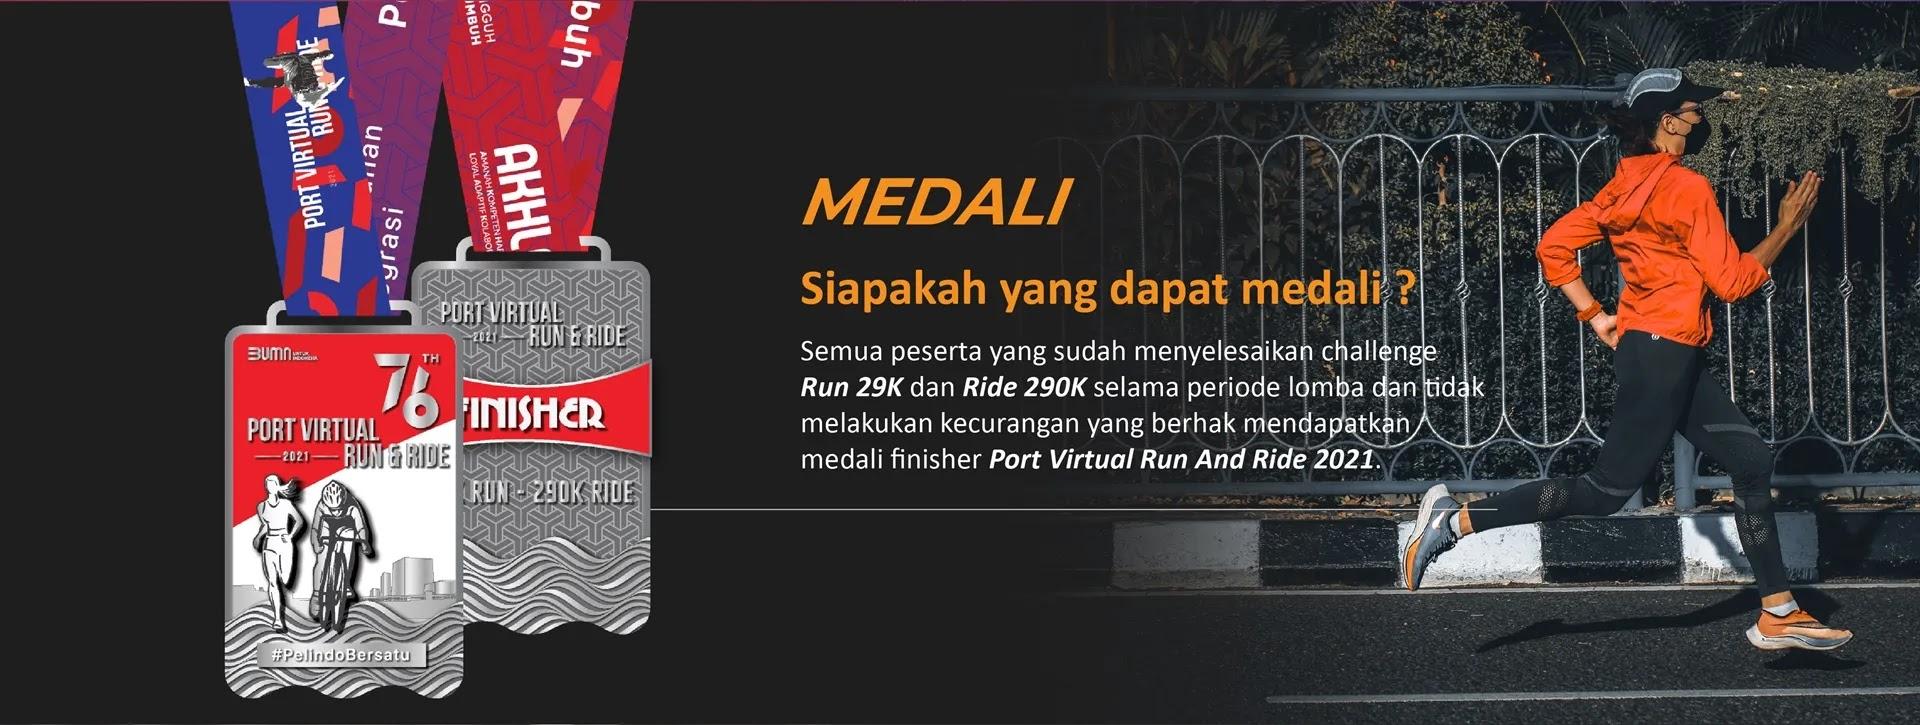 Medali � Port Virtual Run and Ride • 2021